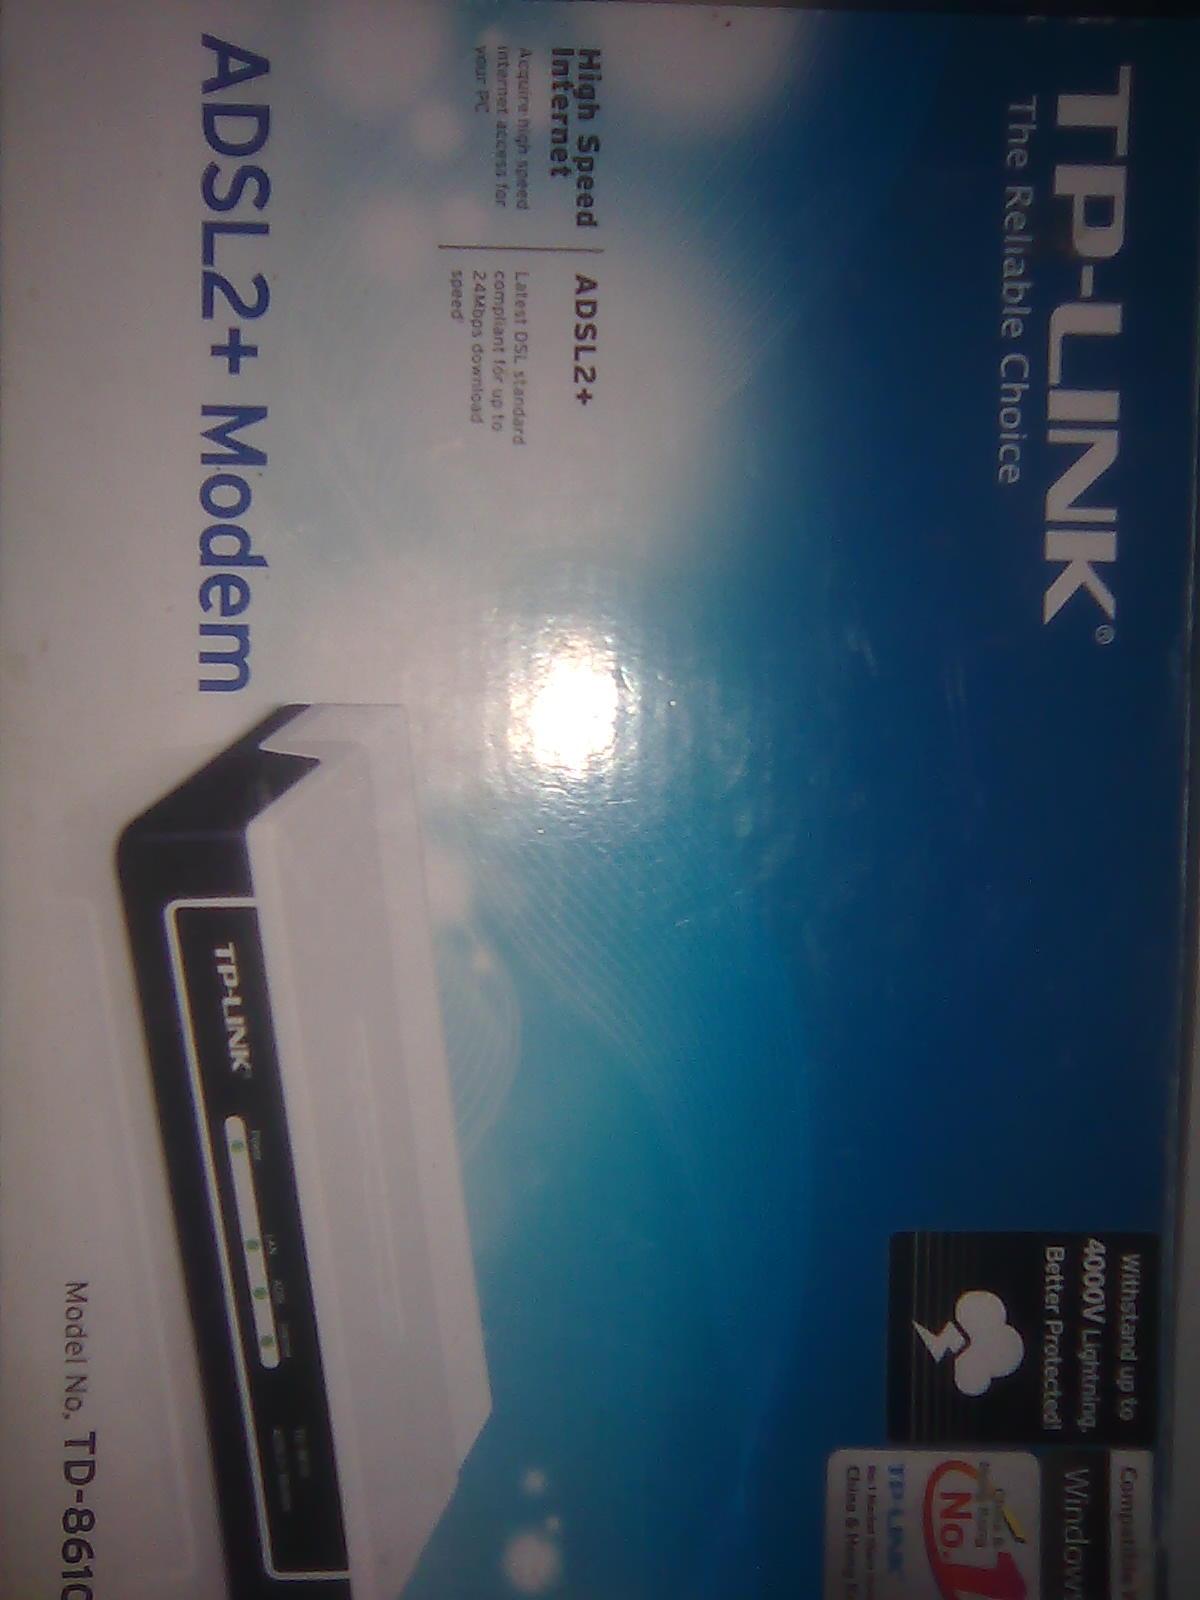 TPLINK ADSL2 MODEM td8610   ClickBD